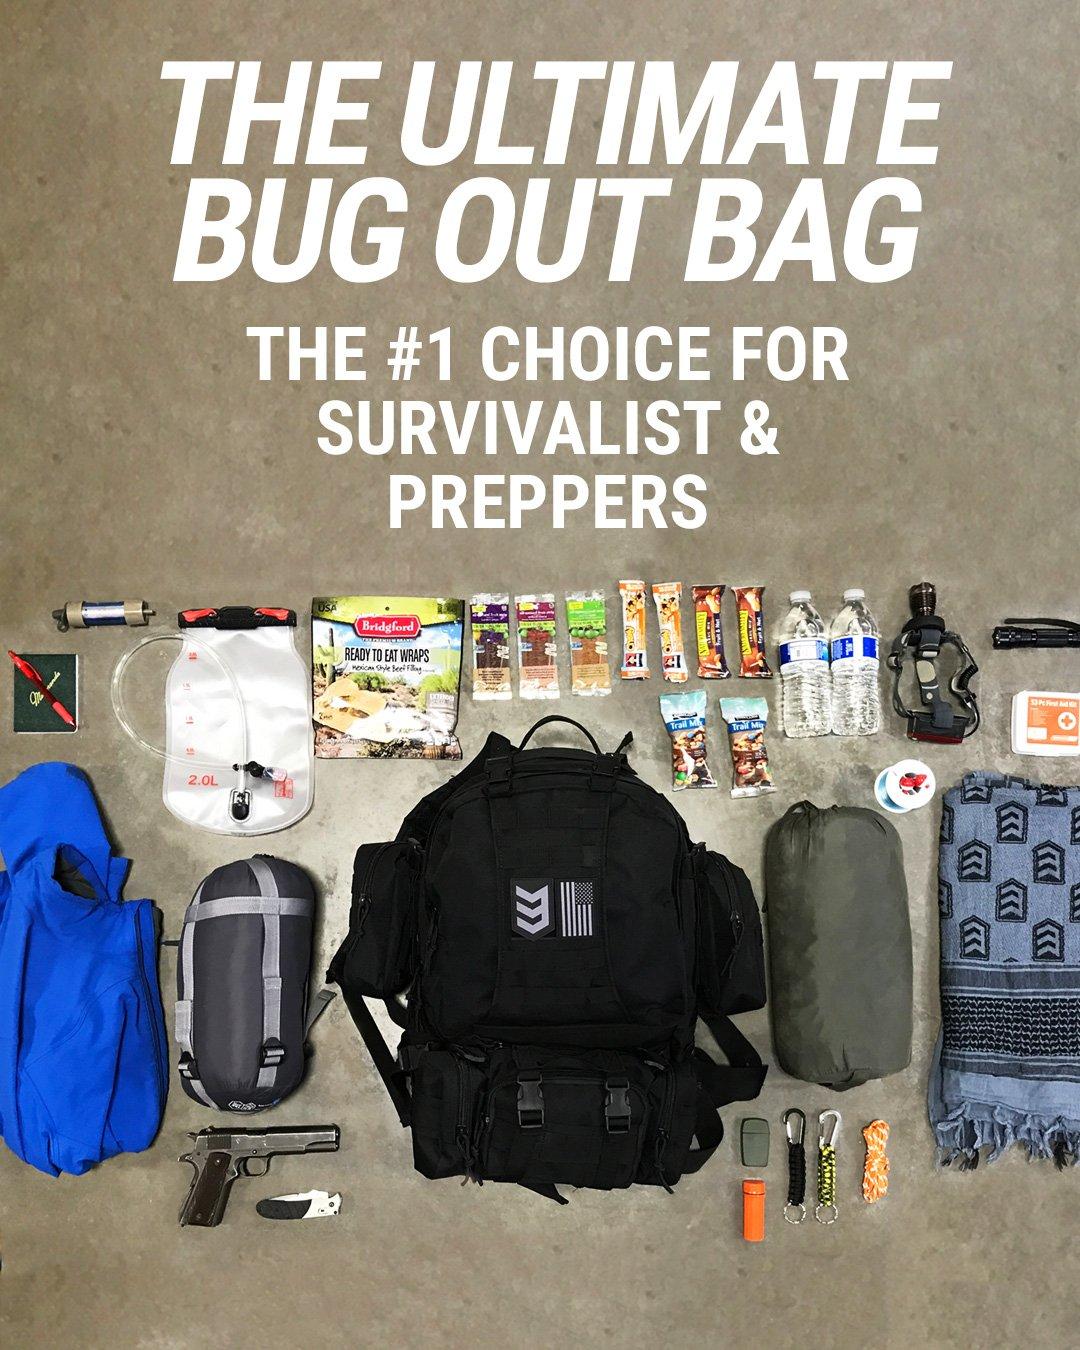 3V Gear Paratus 3-Day Bug Out Bag